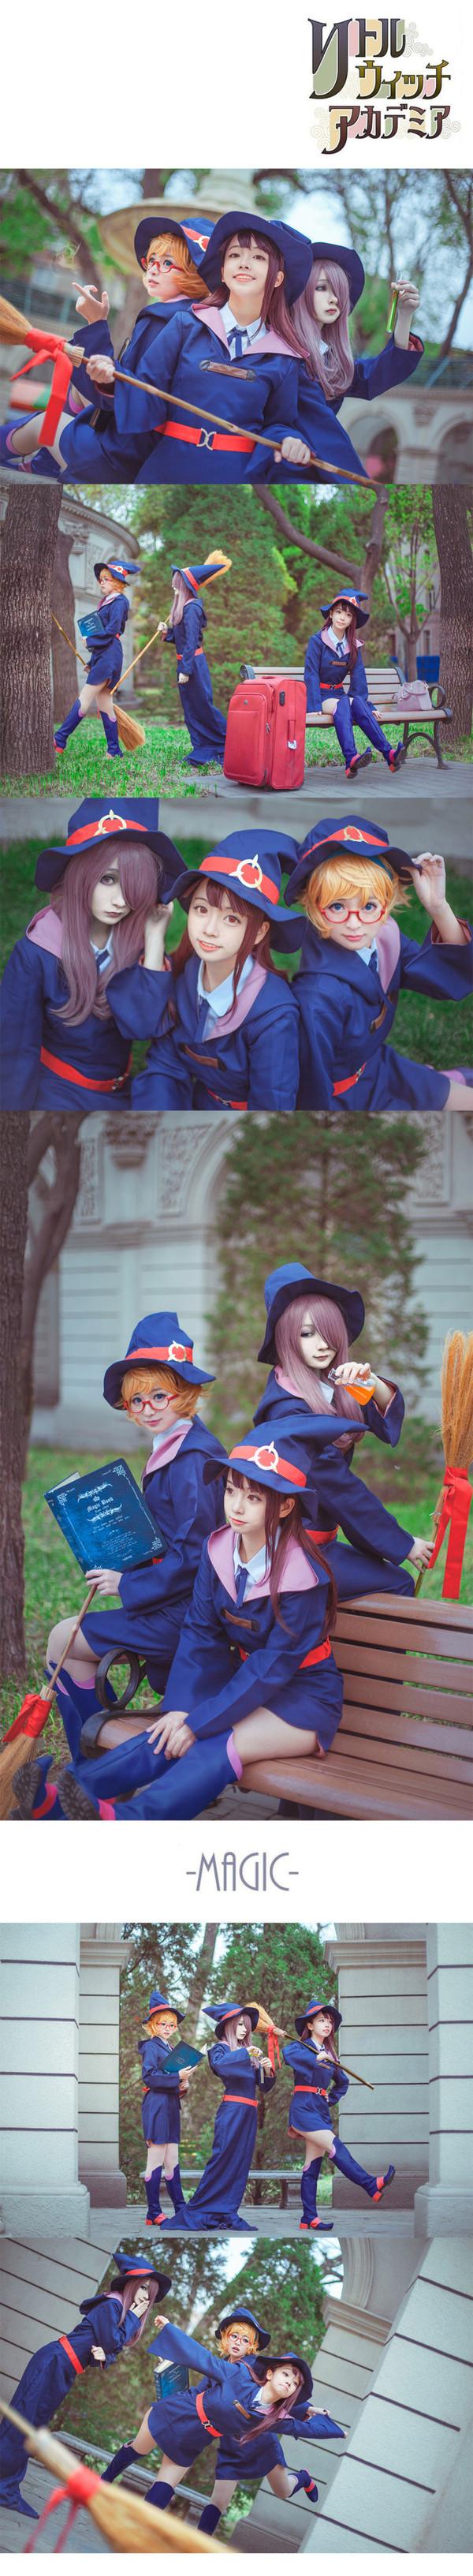 Little Witch Academia cosplay Little Witch Academia, Косплей, Аниме, Длиннопост